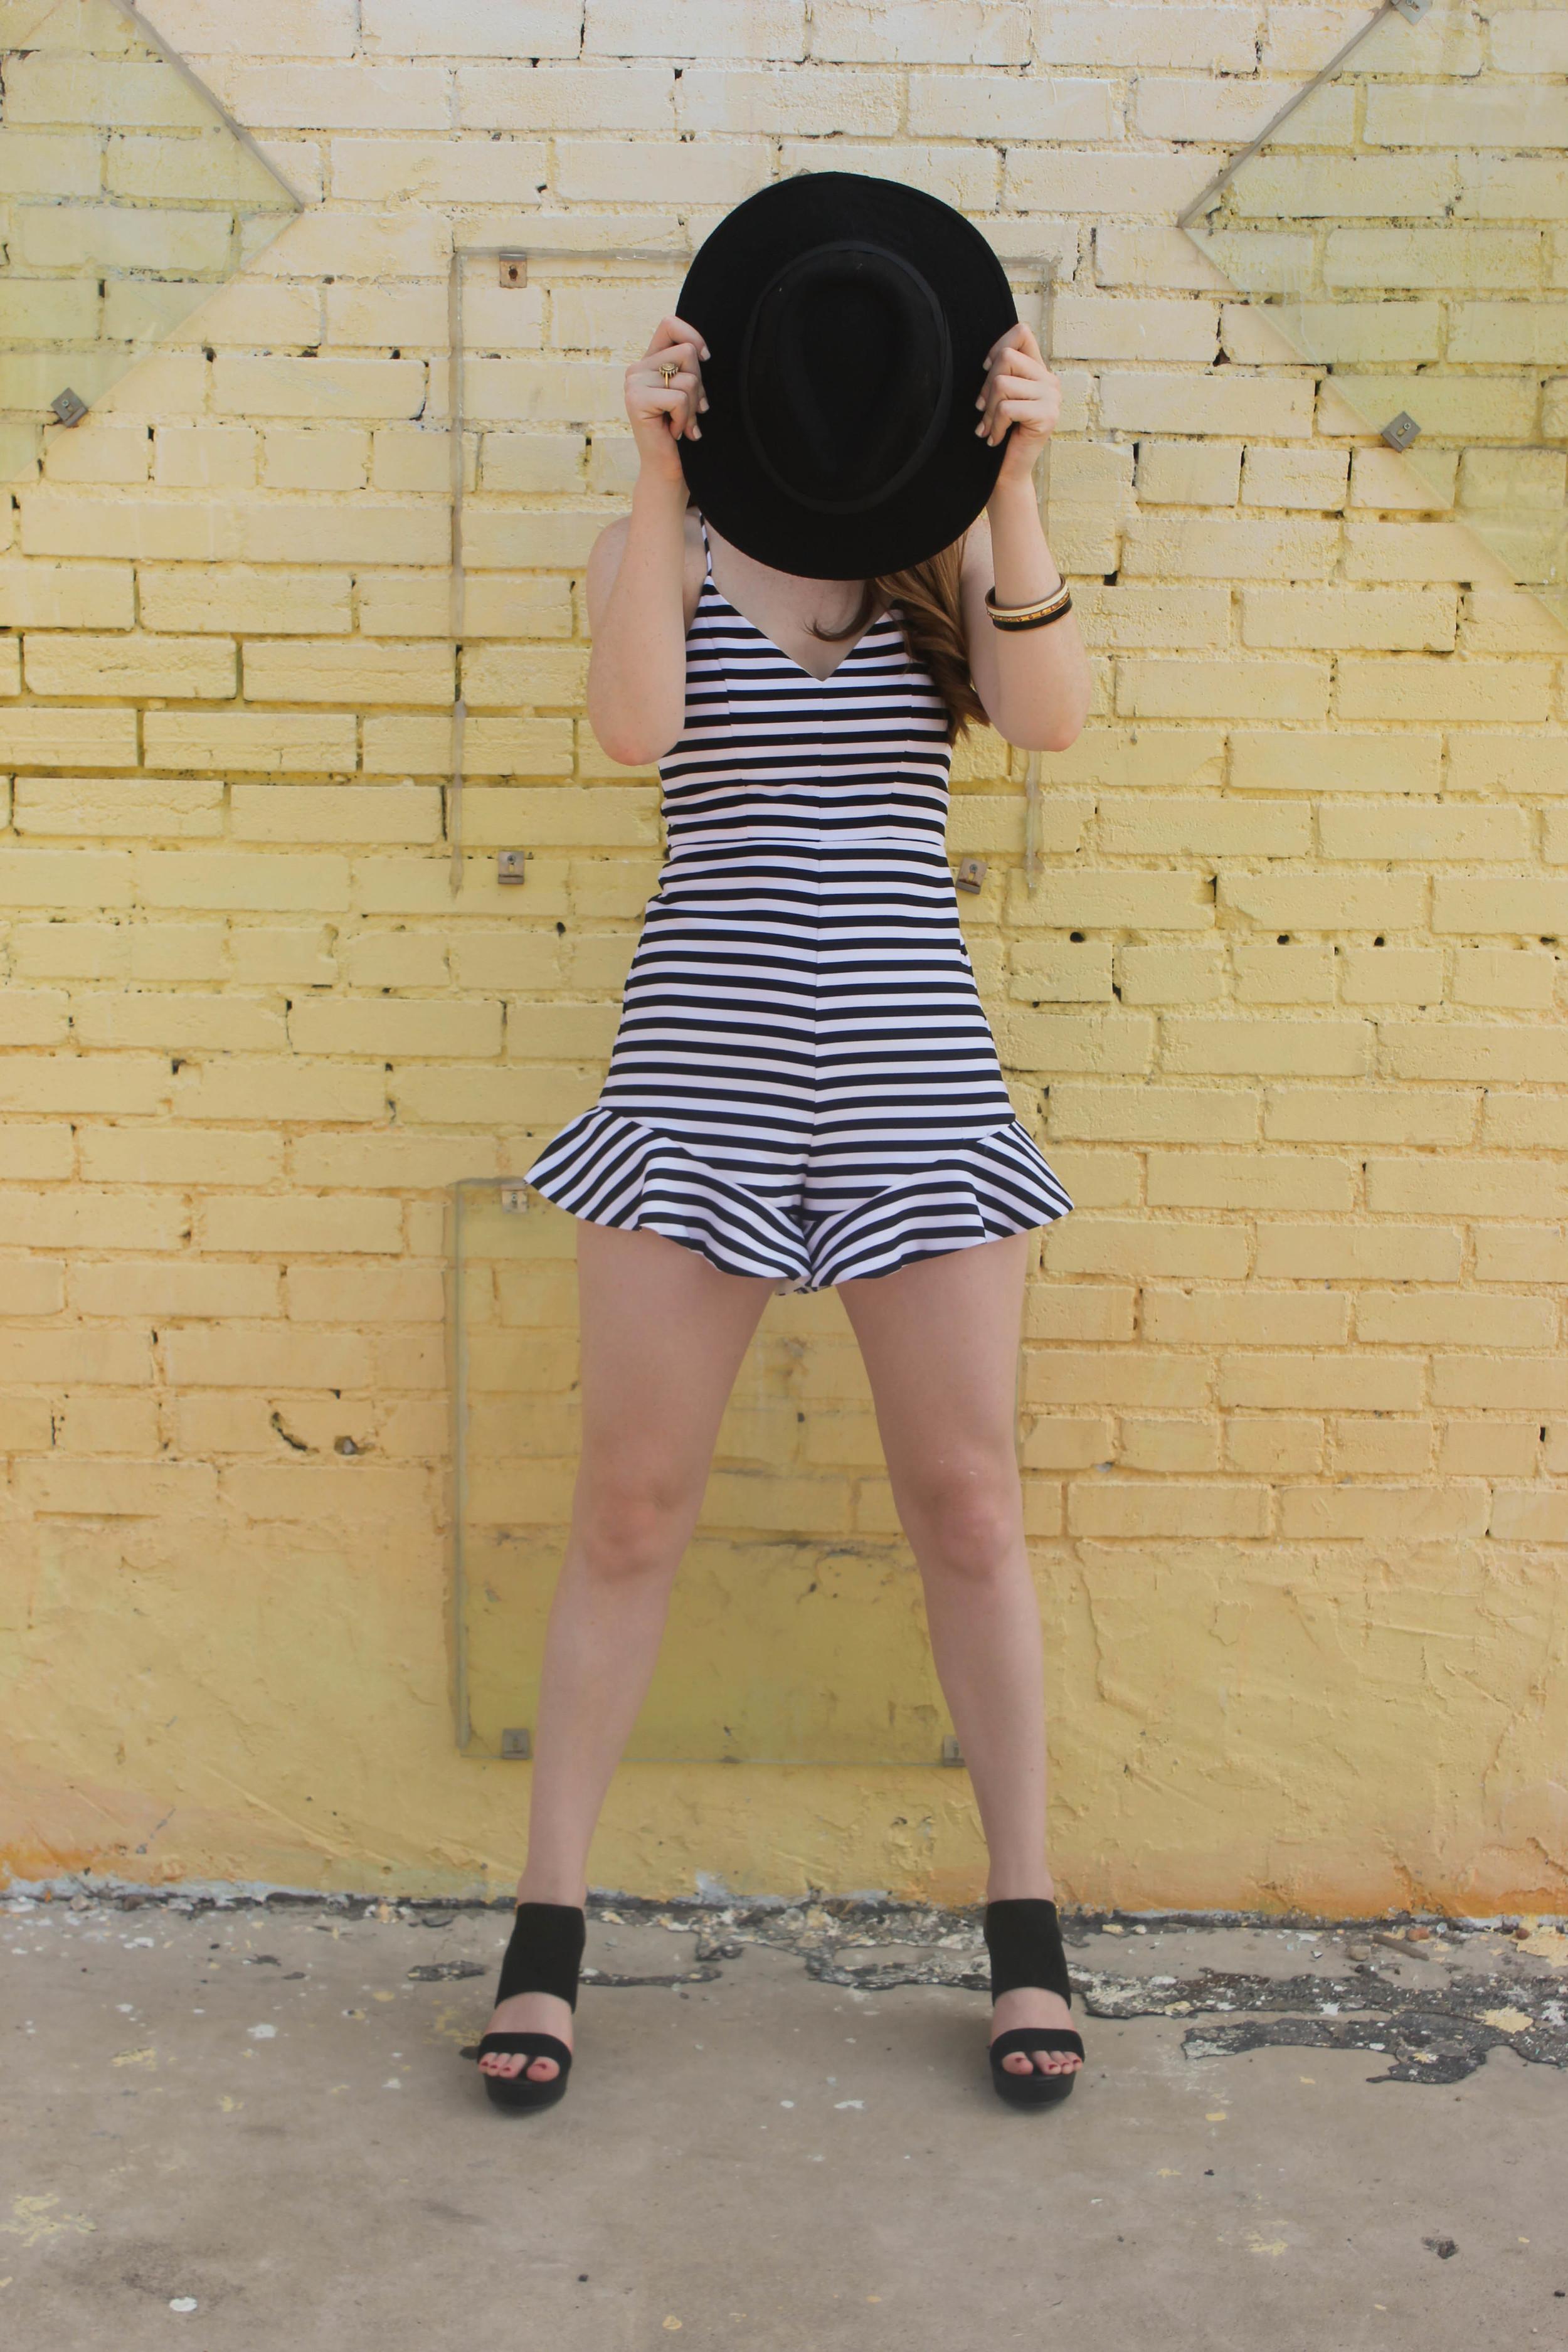 Black and White Romper, Felt Hat | Southern Elle Style | Dallas Fashion Blogger